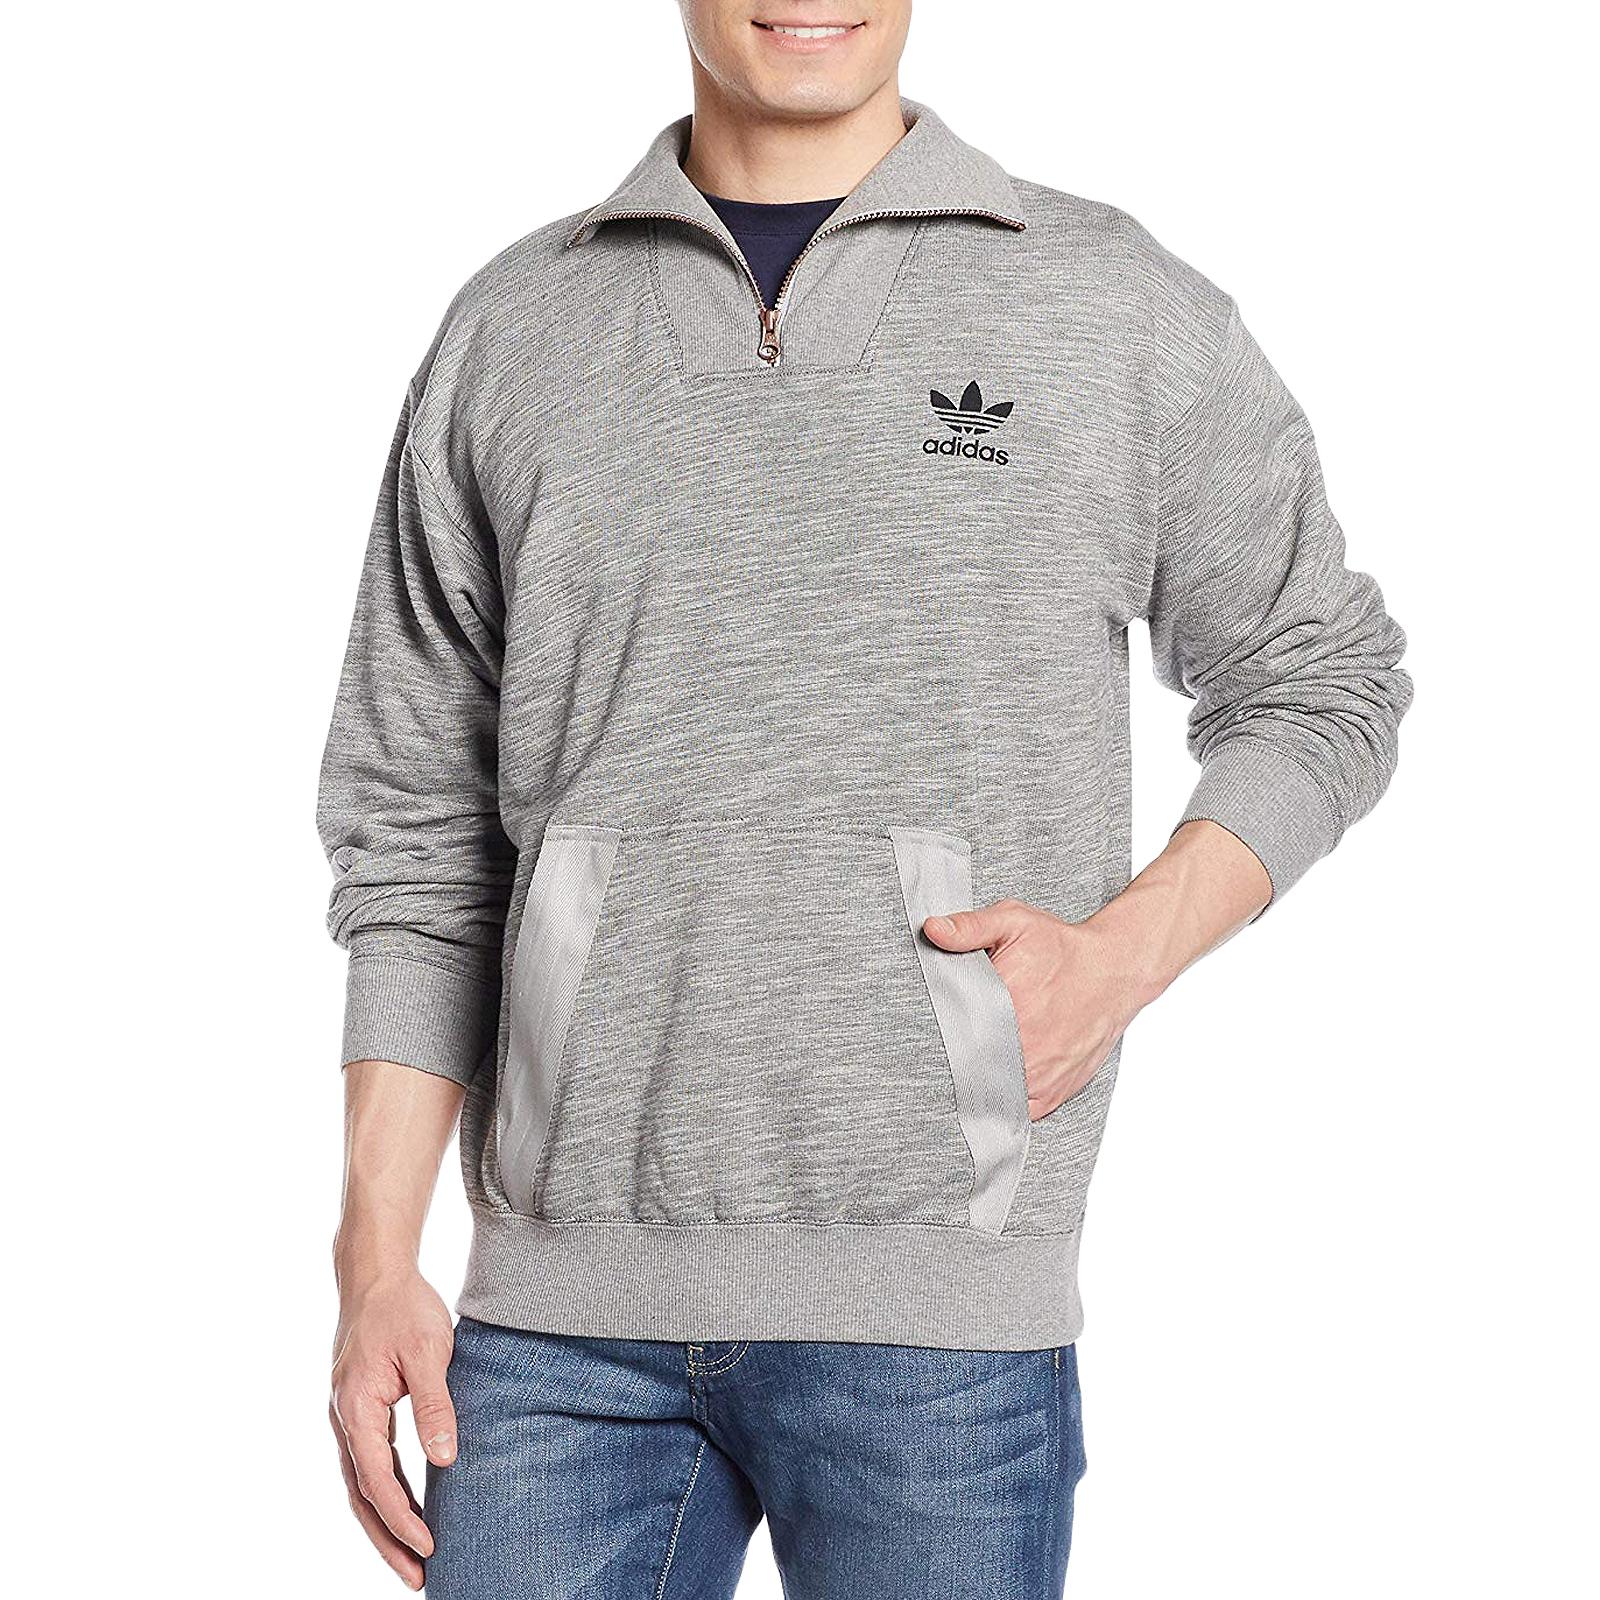 82b1c41d1 Details about adidas Originals Mens Noize Half Zip Long Sleeve Cotton Pullover  Sweatshirt-Grey